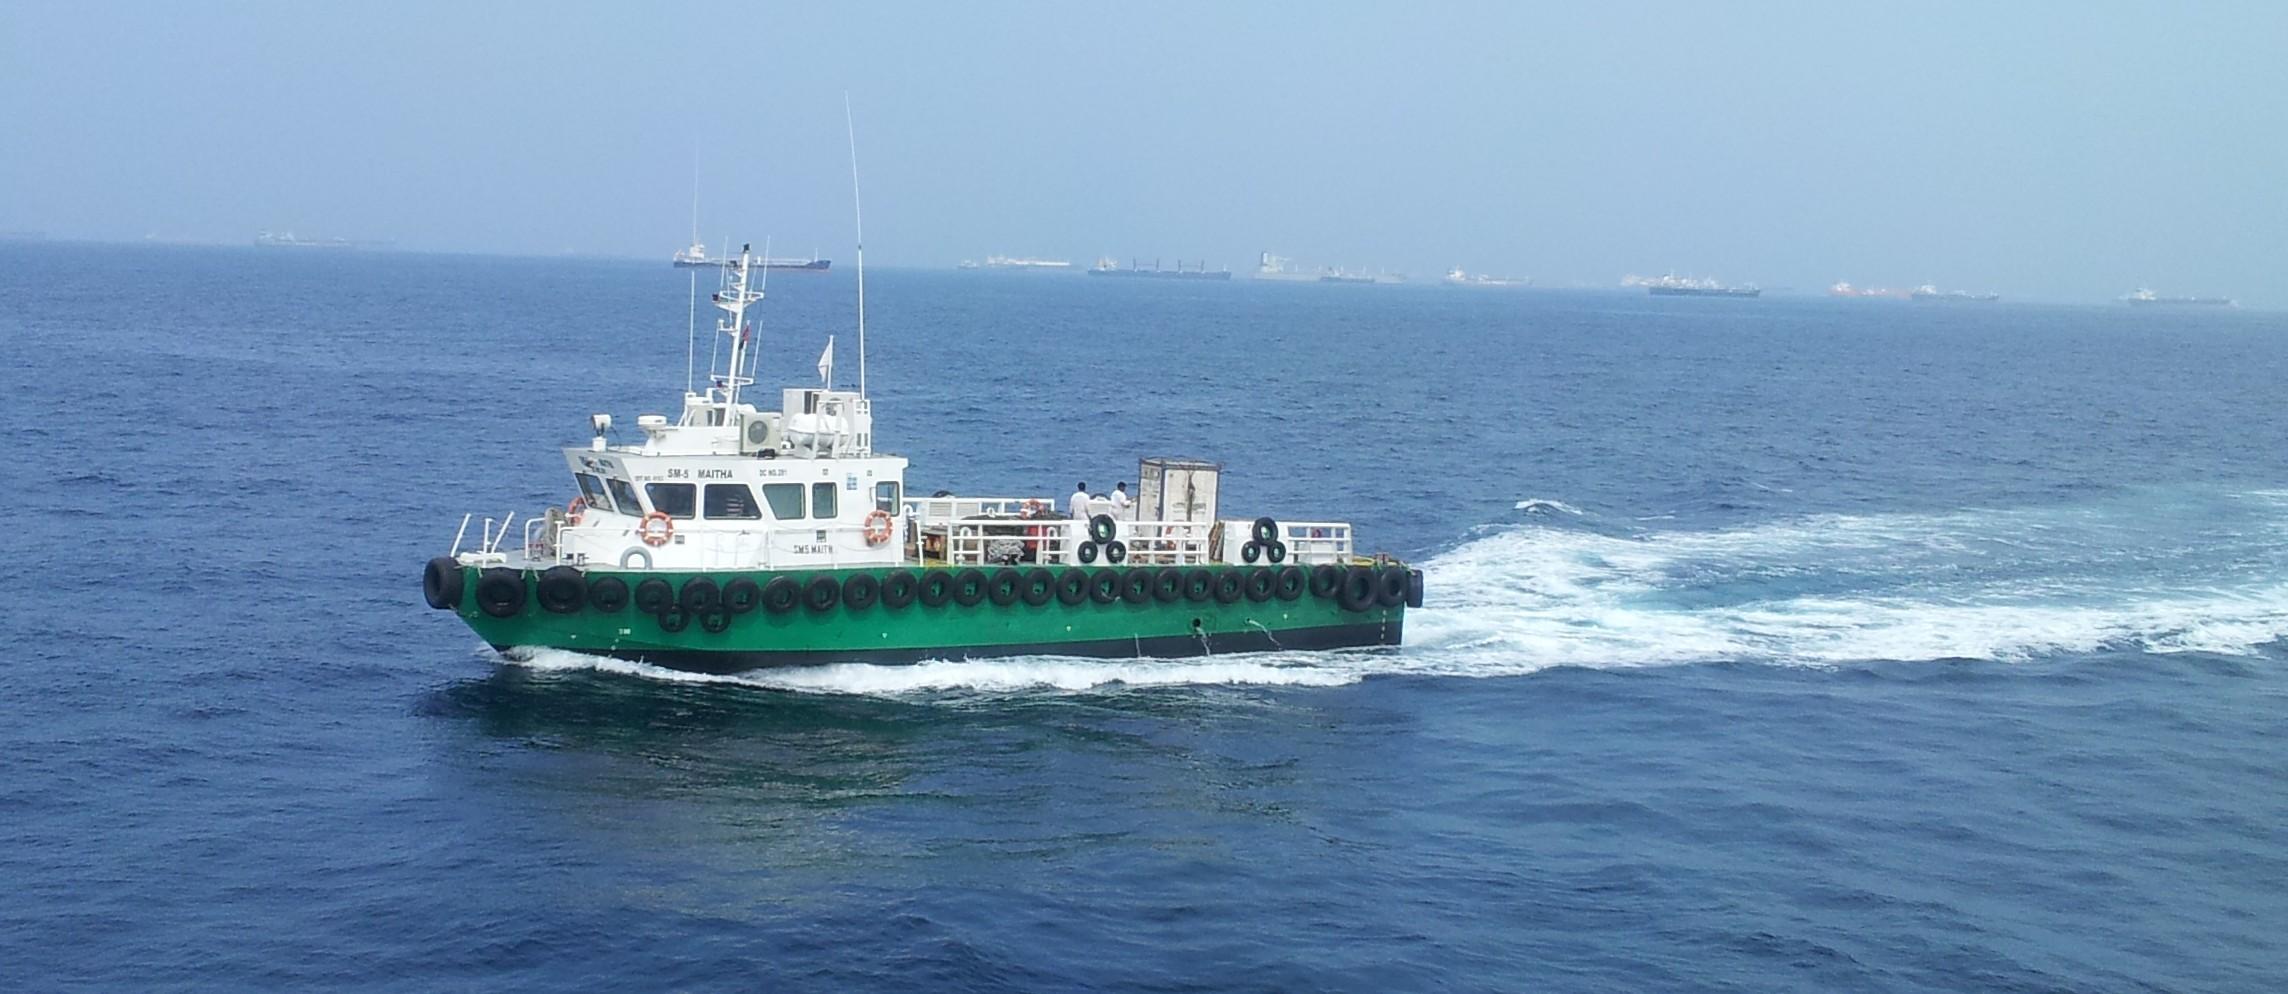 Seamaster Maritime L L C  | LinkedIn